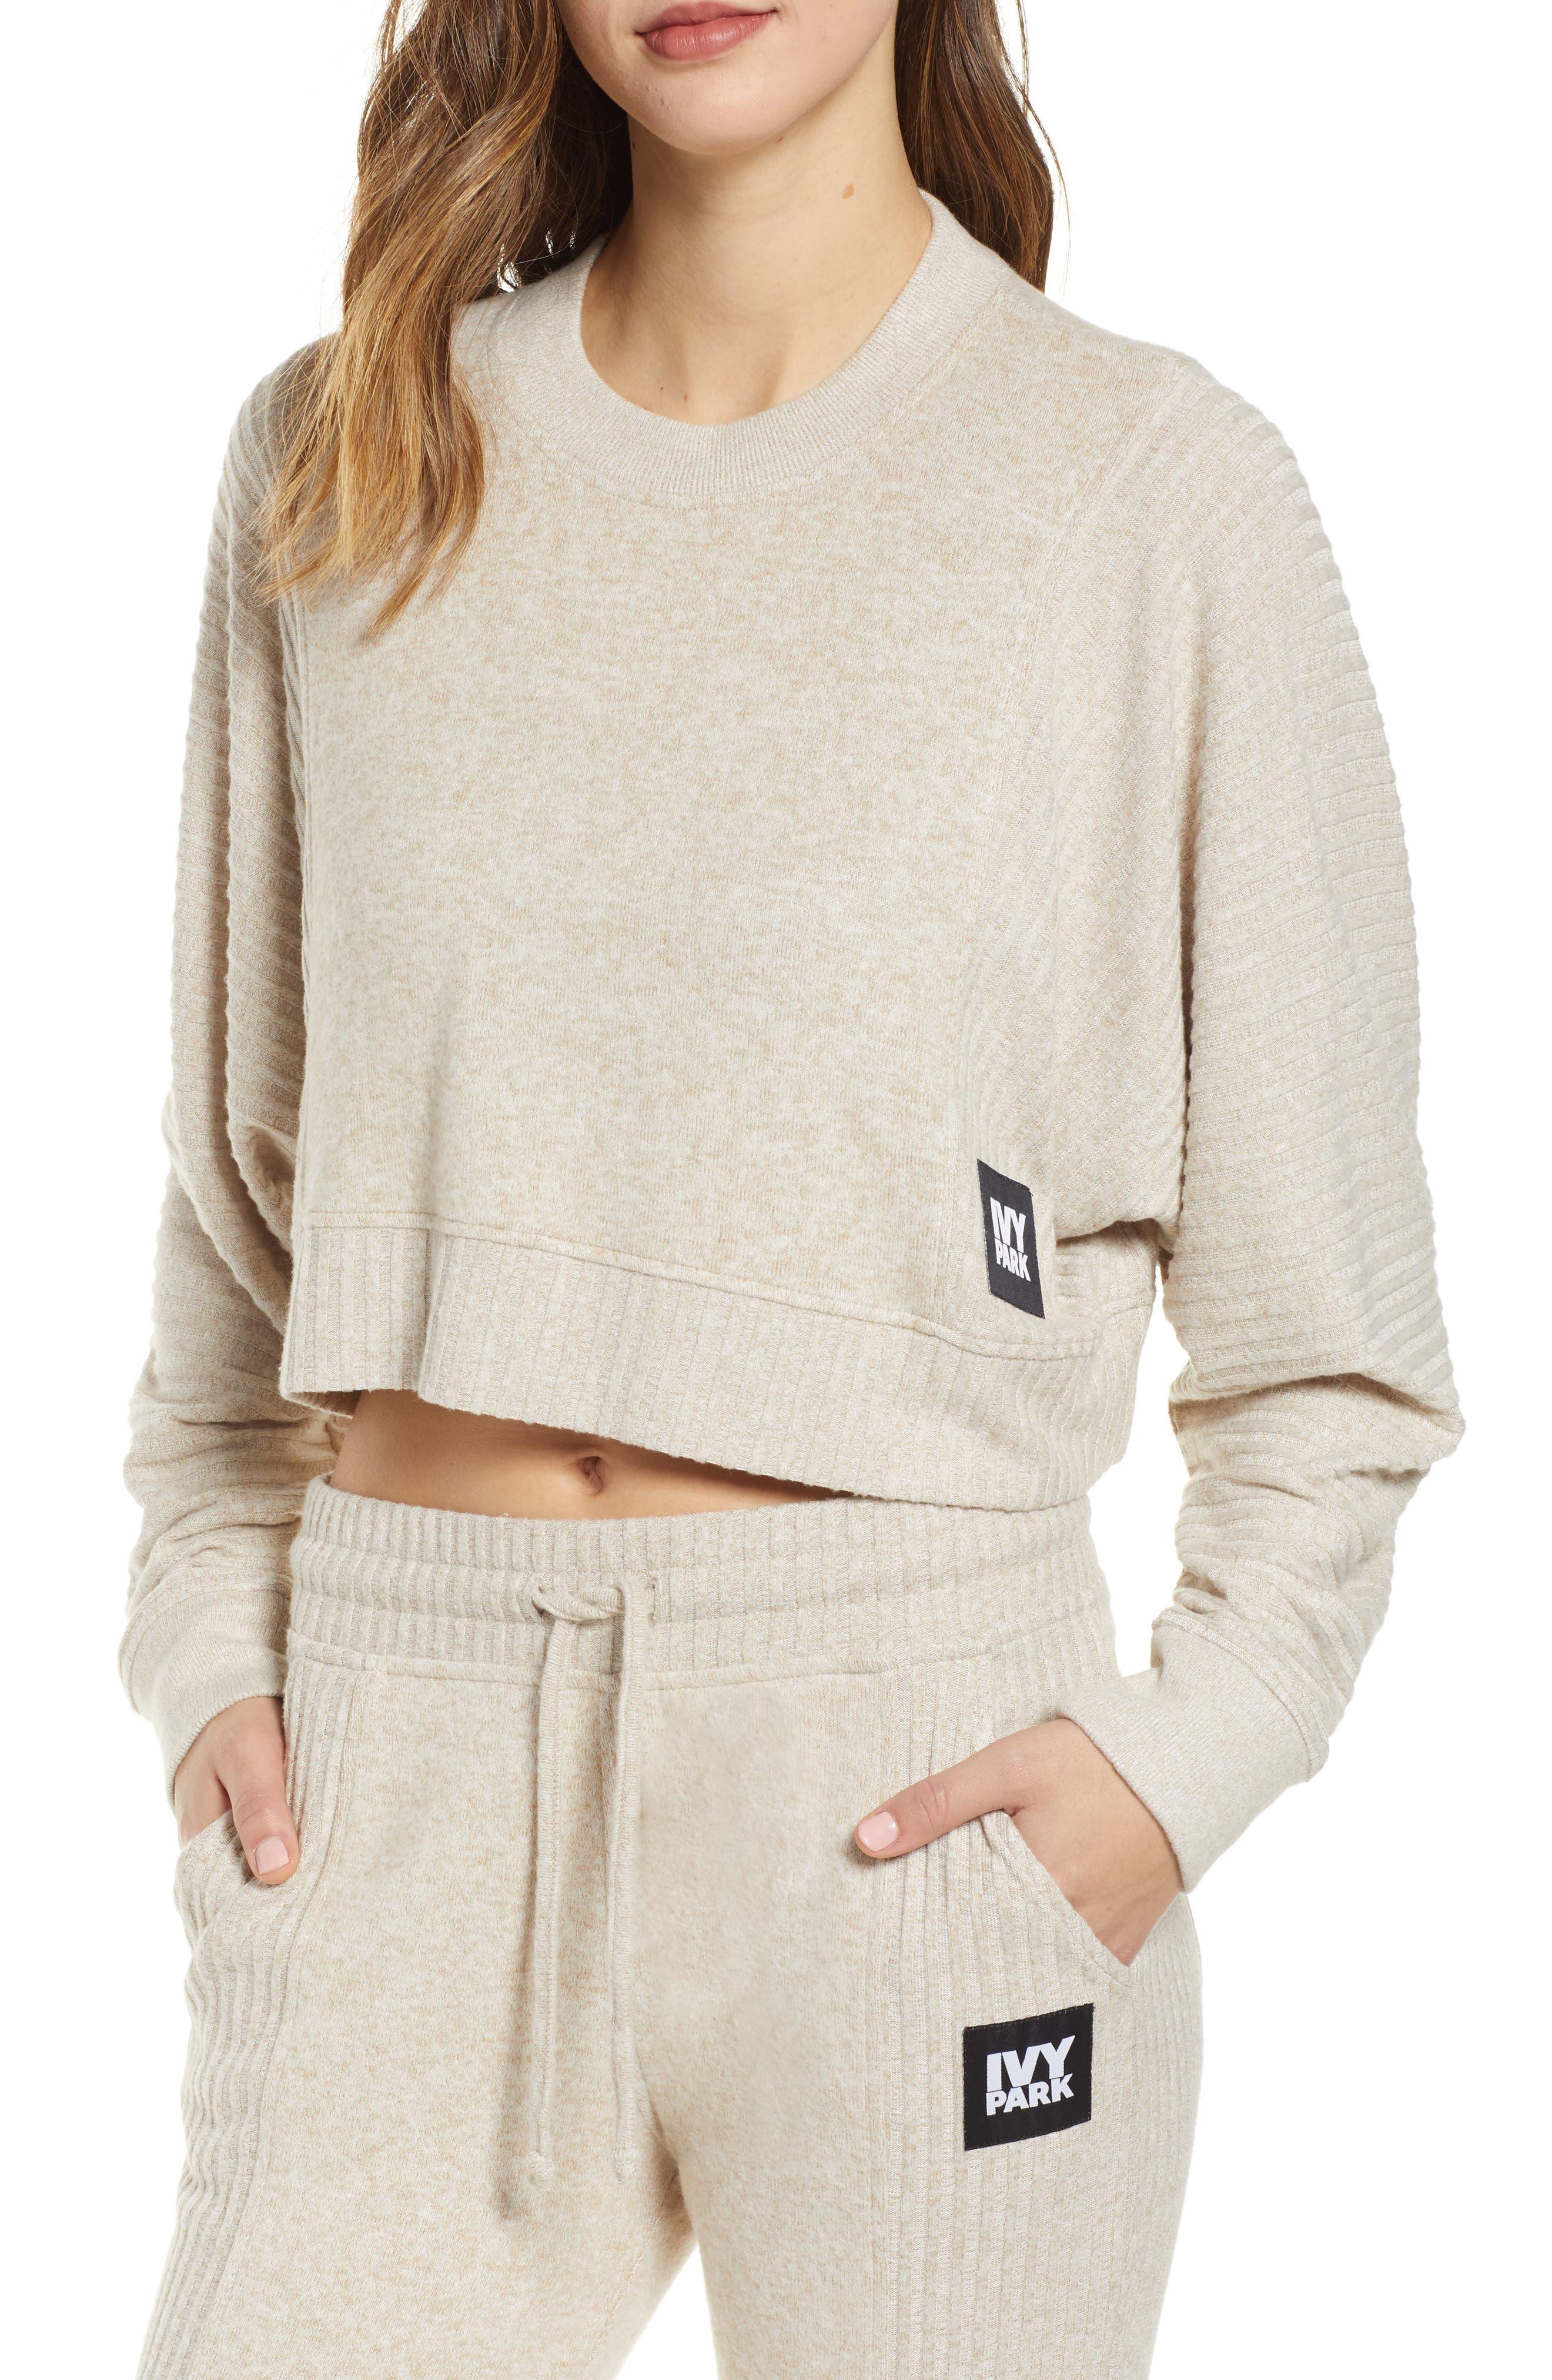 Ivy Park Contrast Rib Crop Lounge Sweatshirt